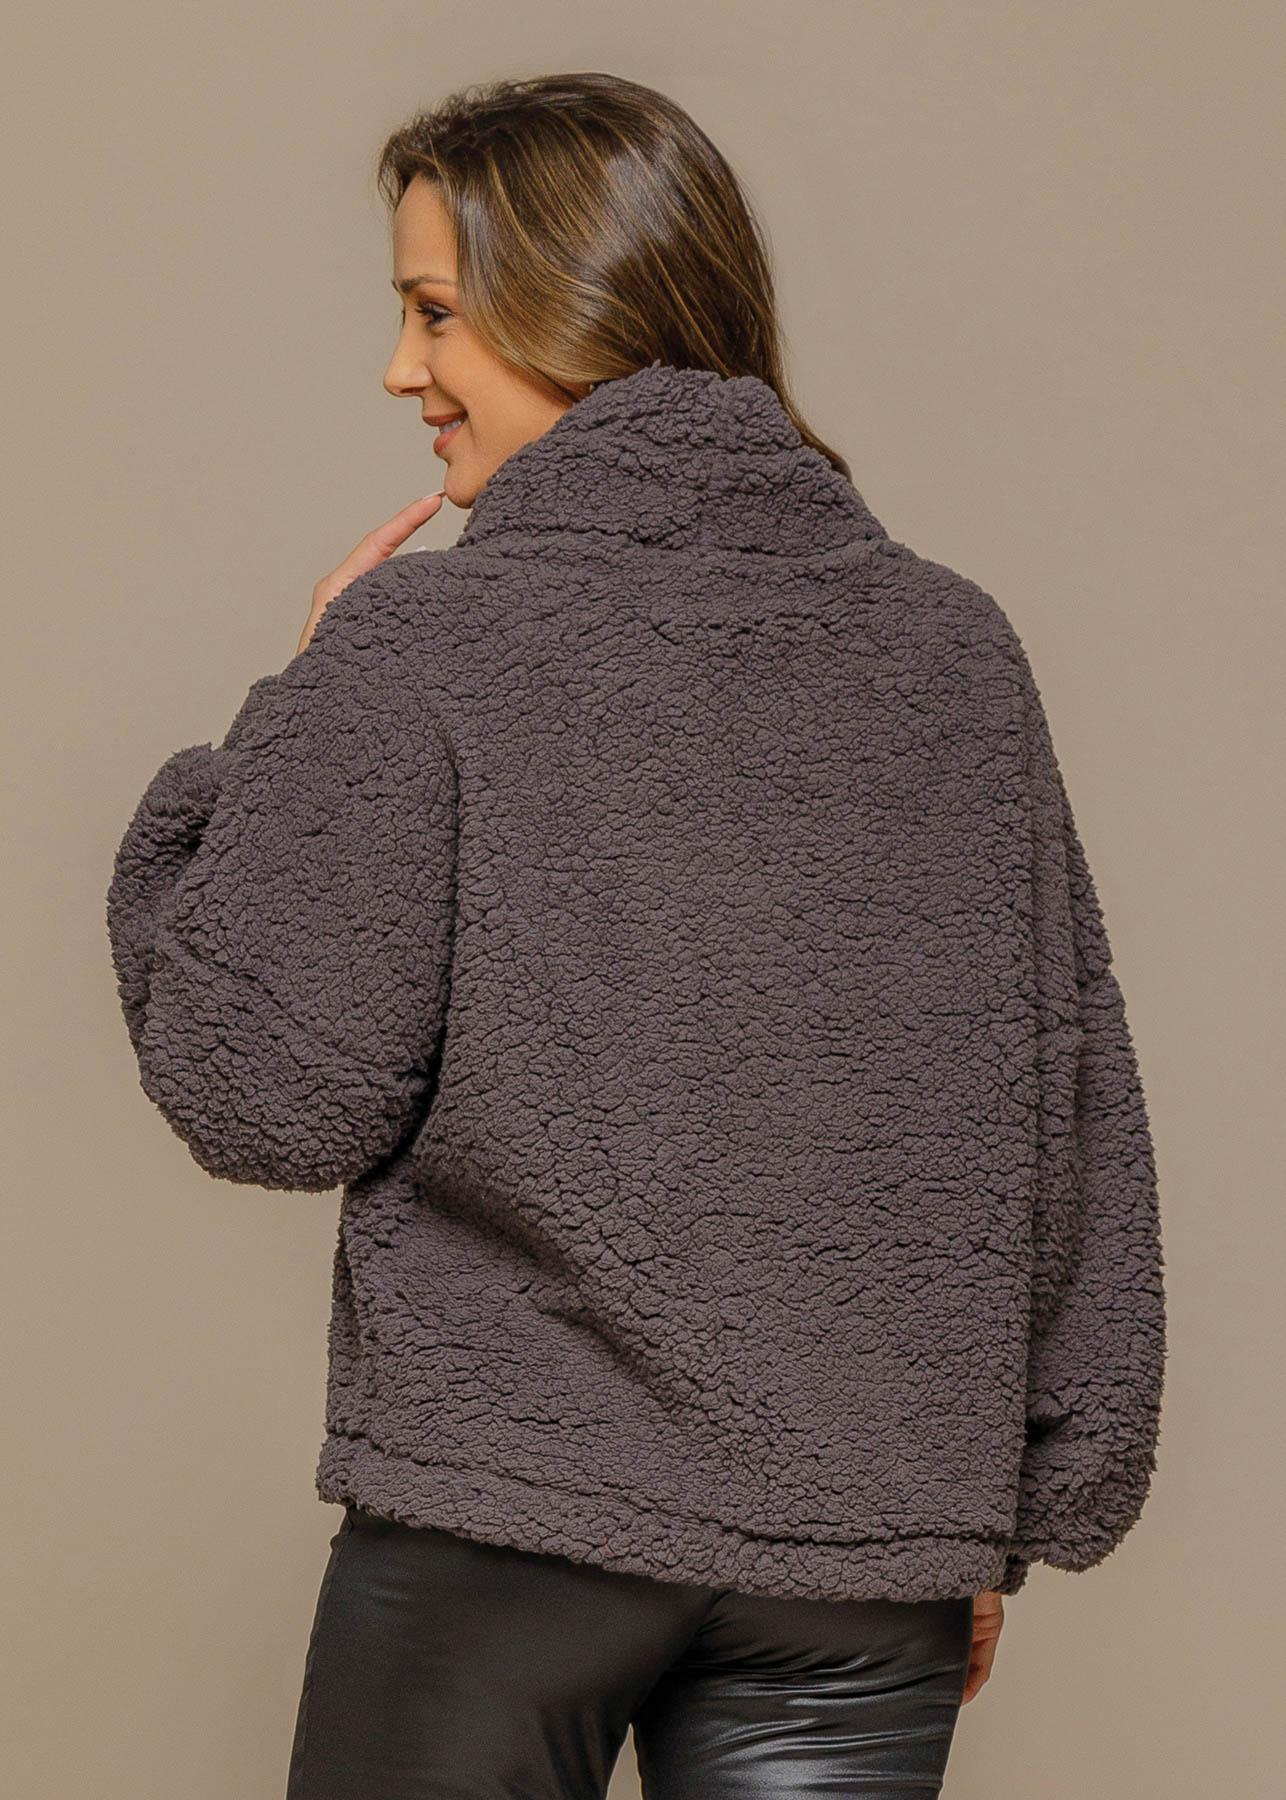 Blusão Sherpa